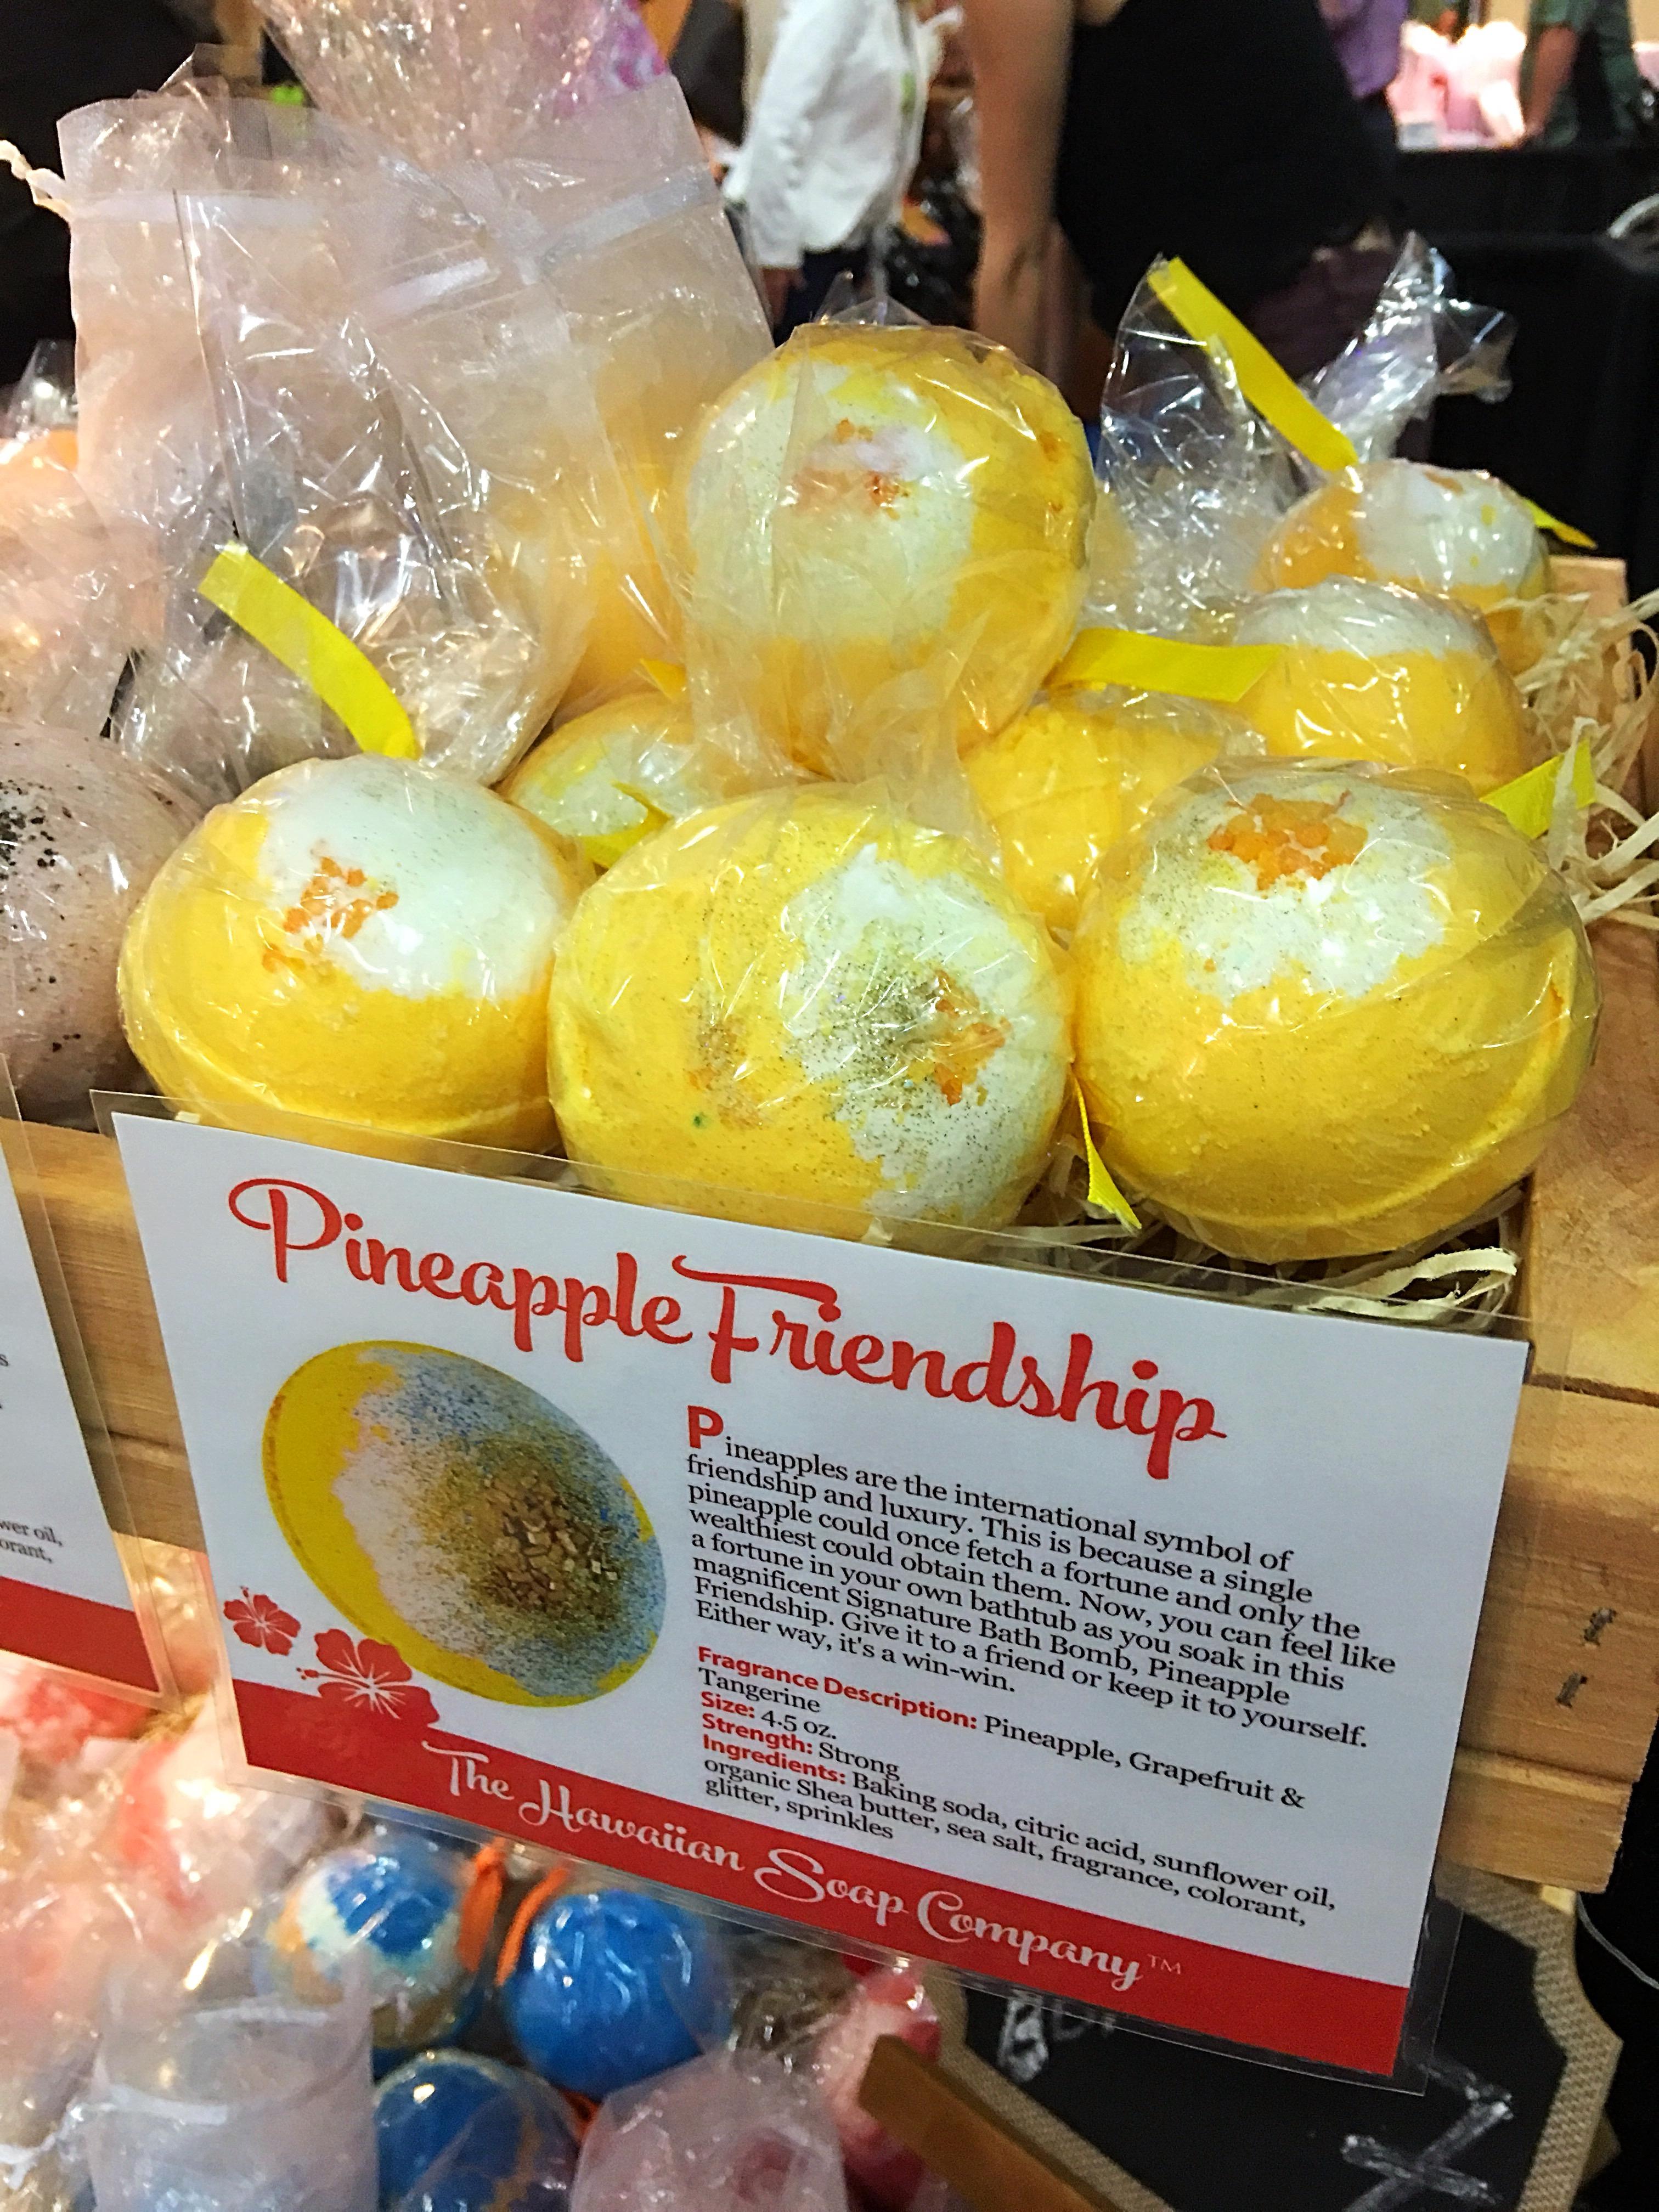 Pineapple Friendship